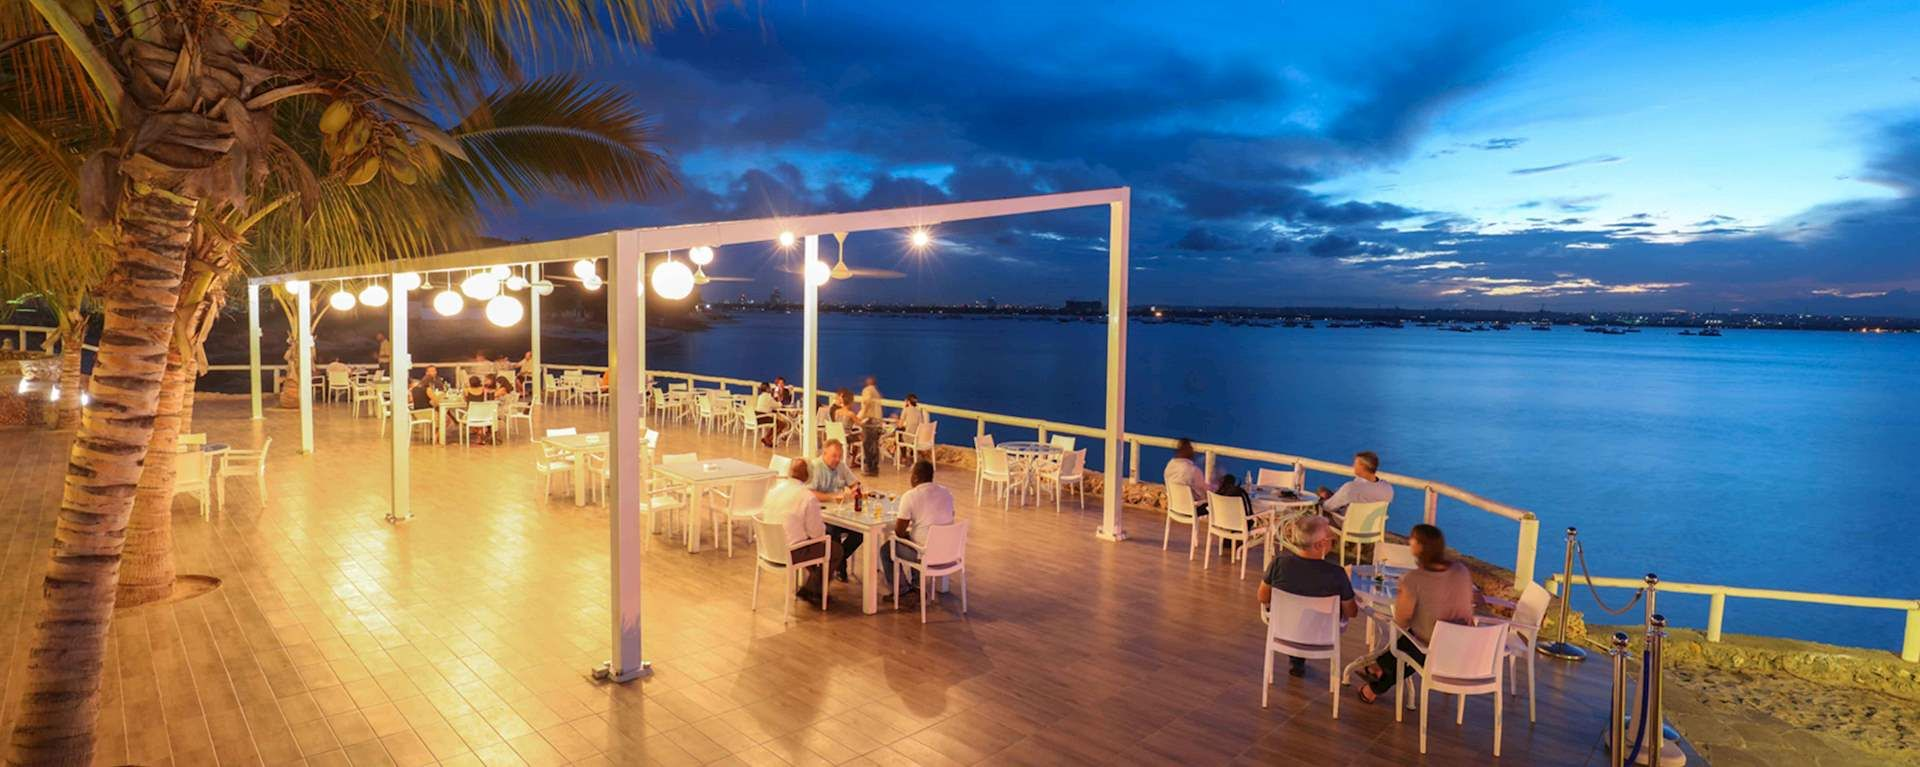 Best Western Coral Beach Hotel8